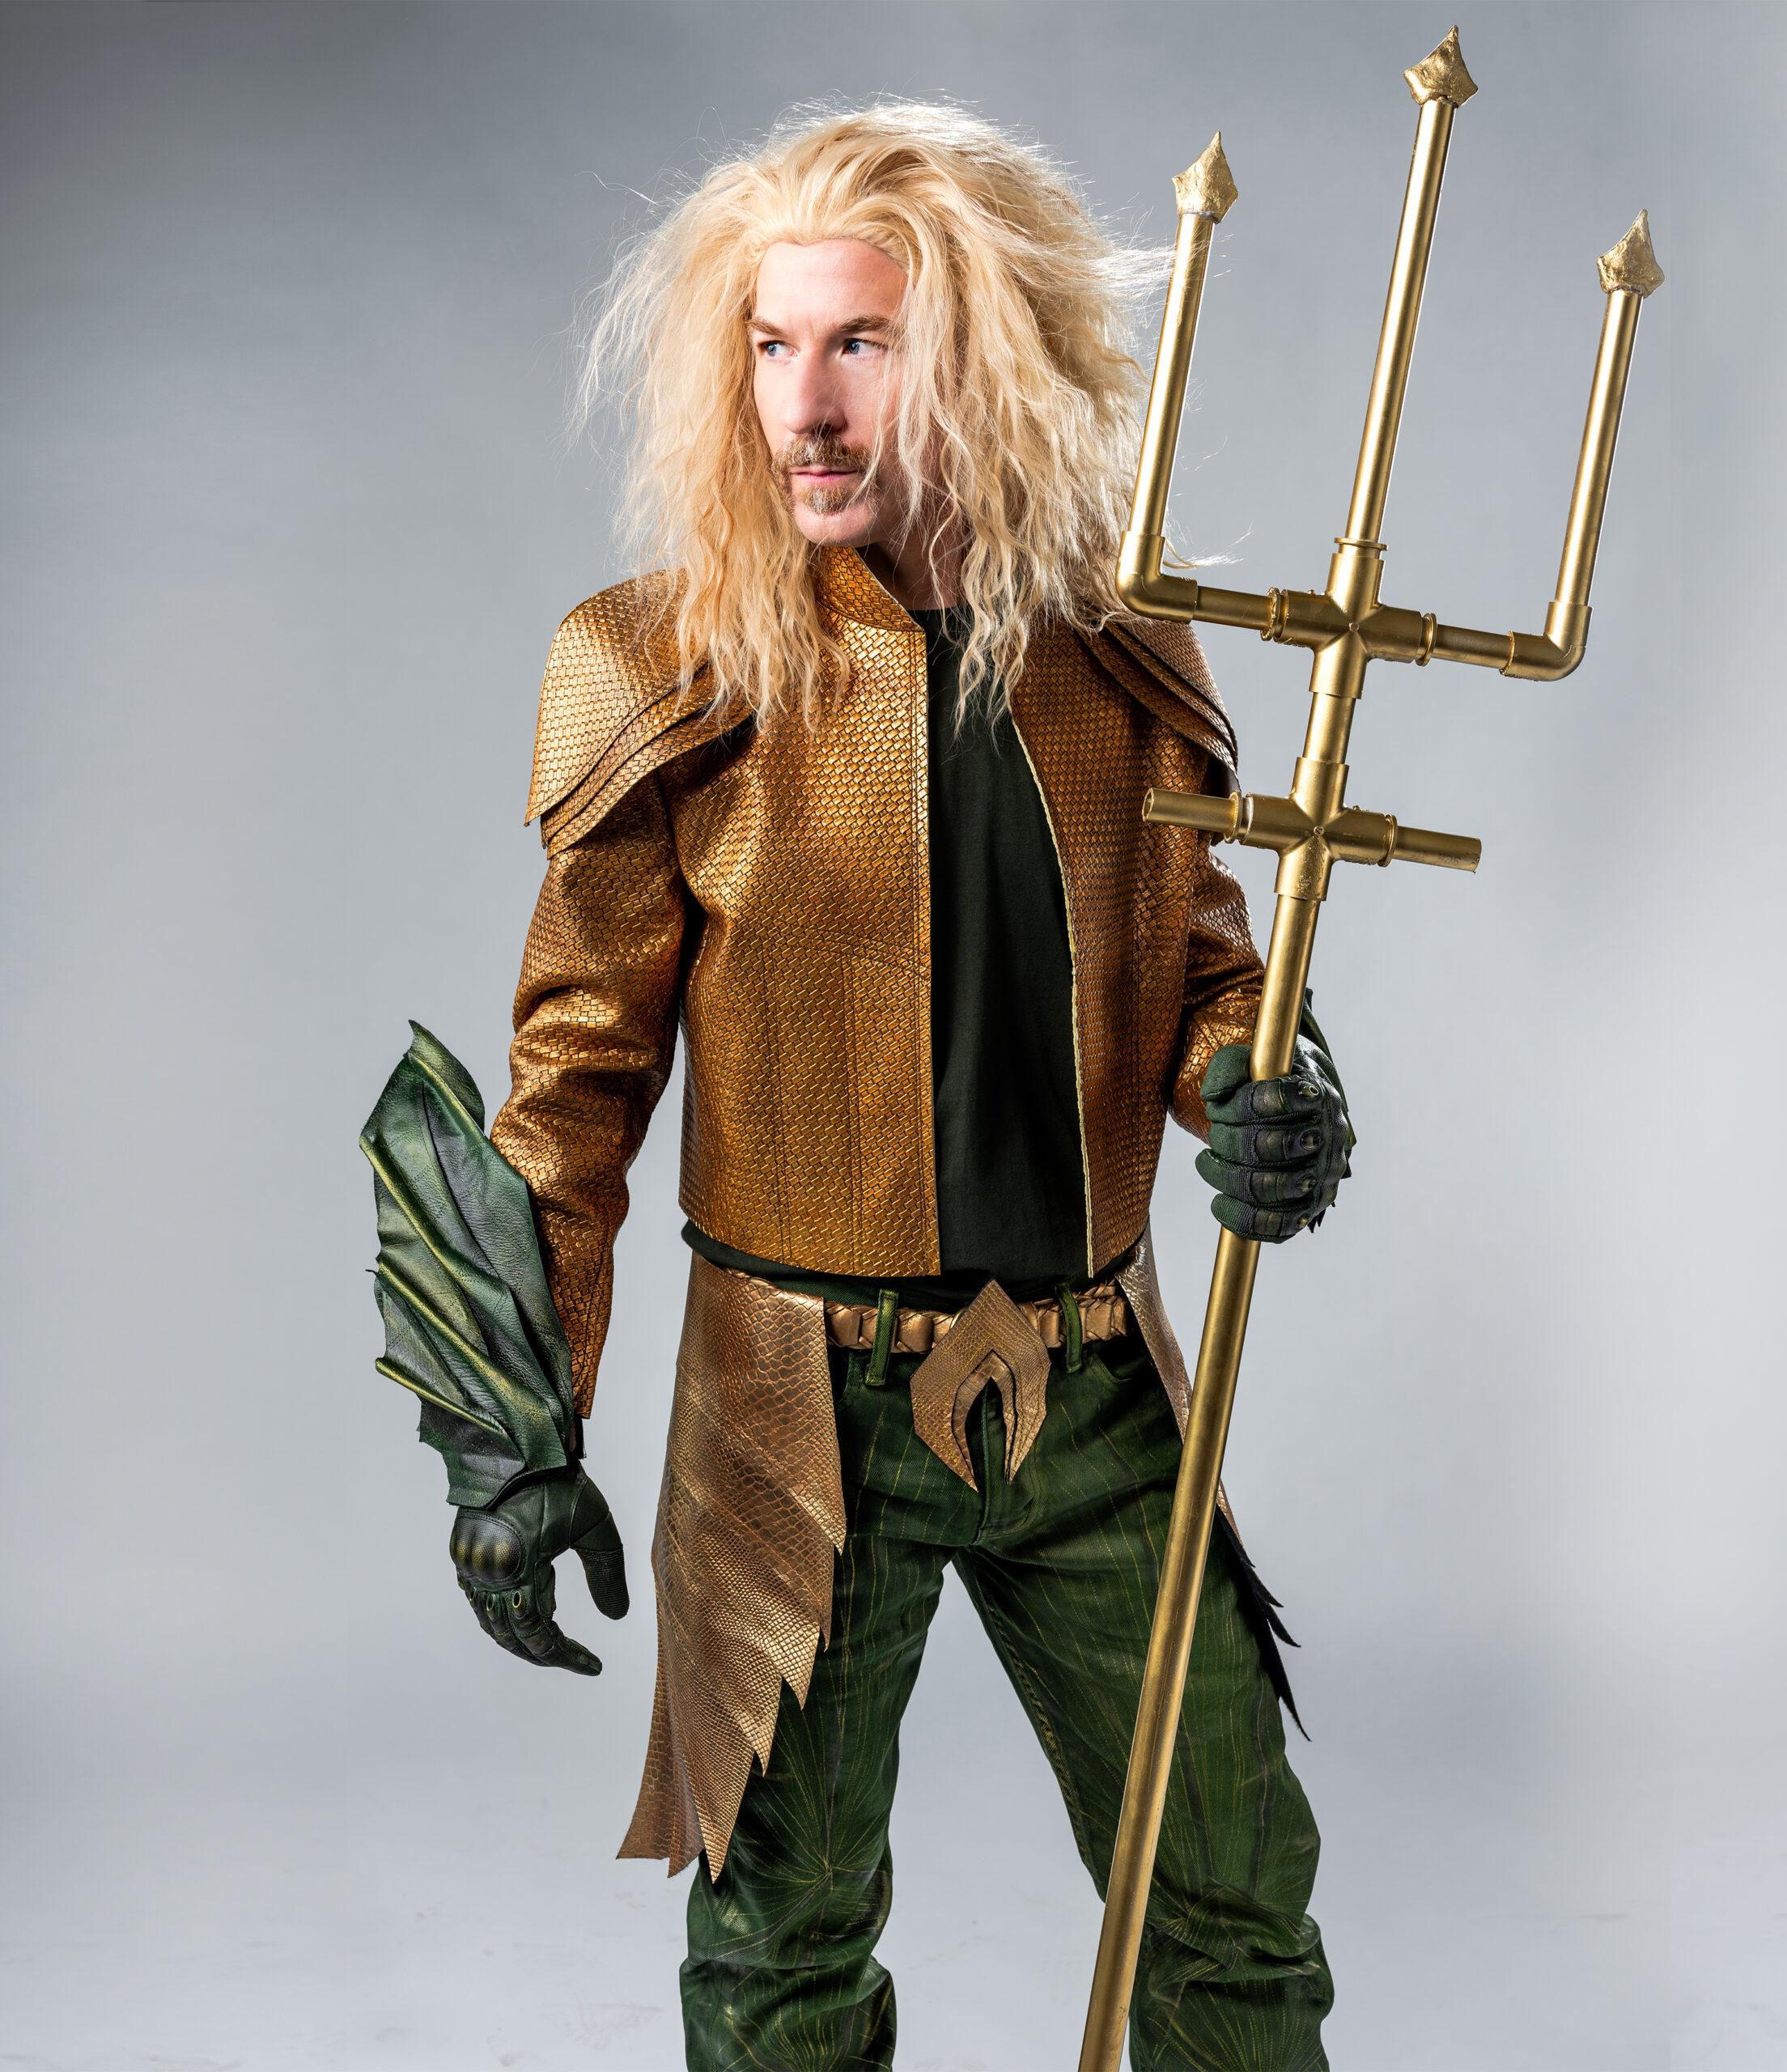 Rob Harriell in Aquaman costume